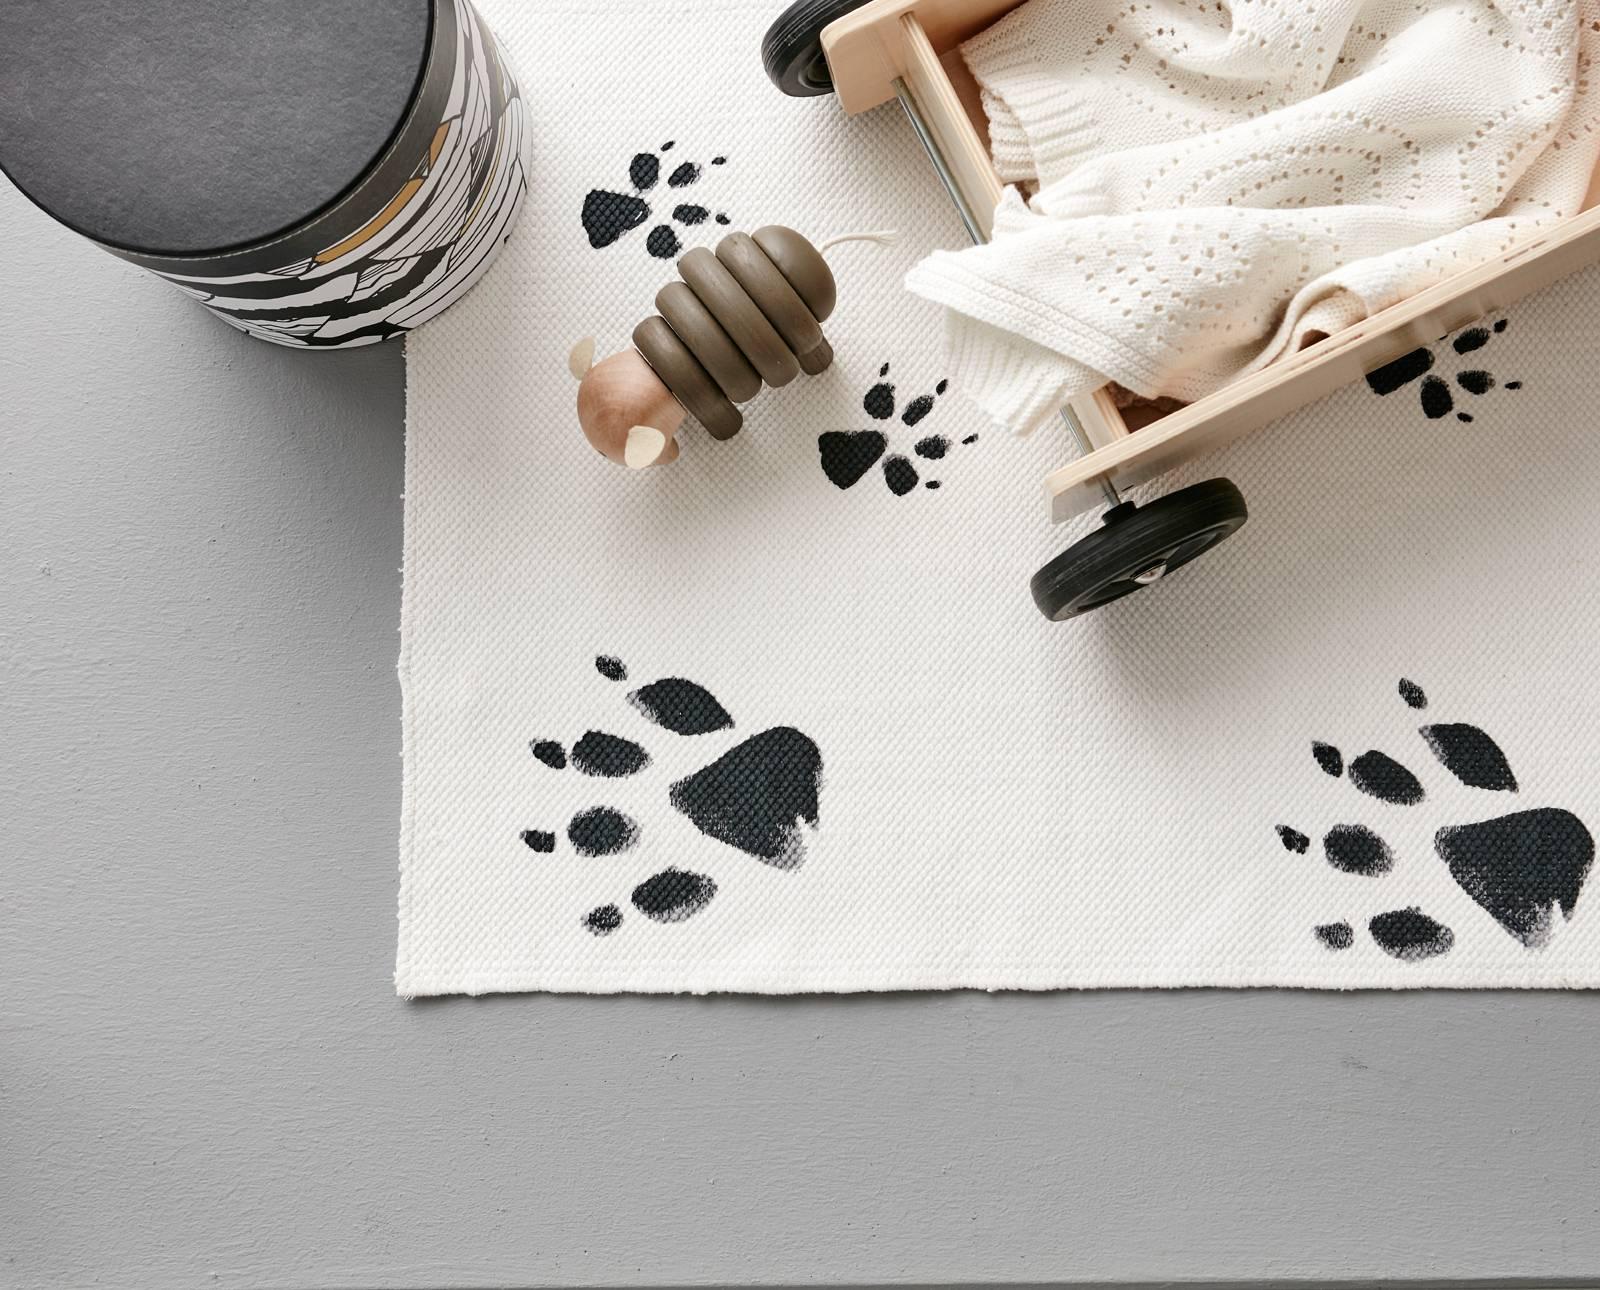 Neo-matto, musta/valkoinen 140x175 cm